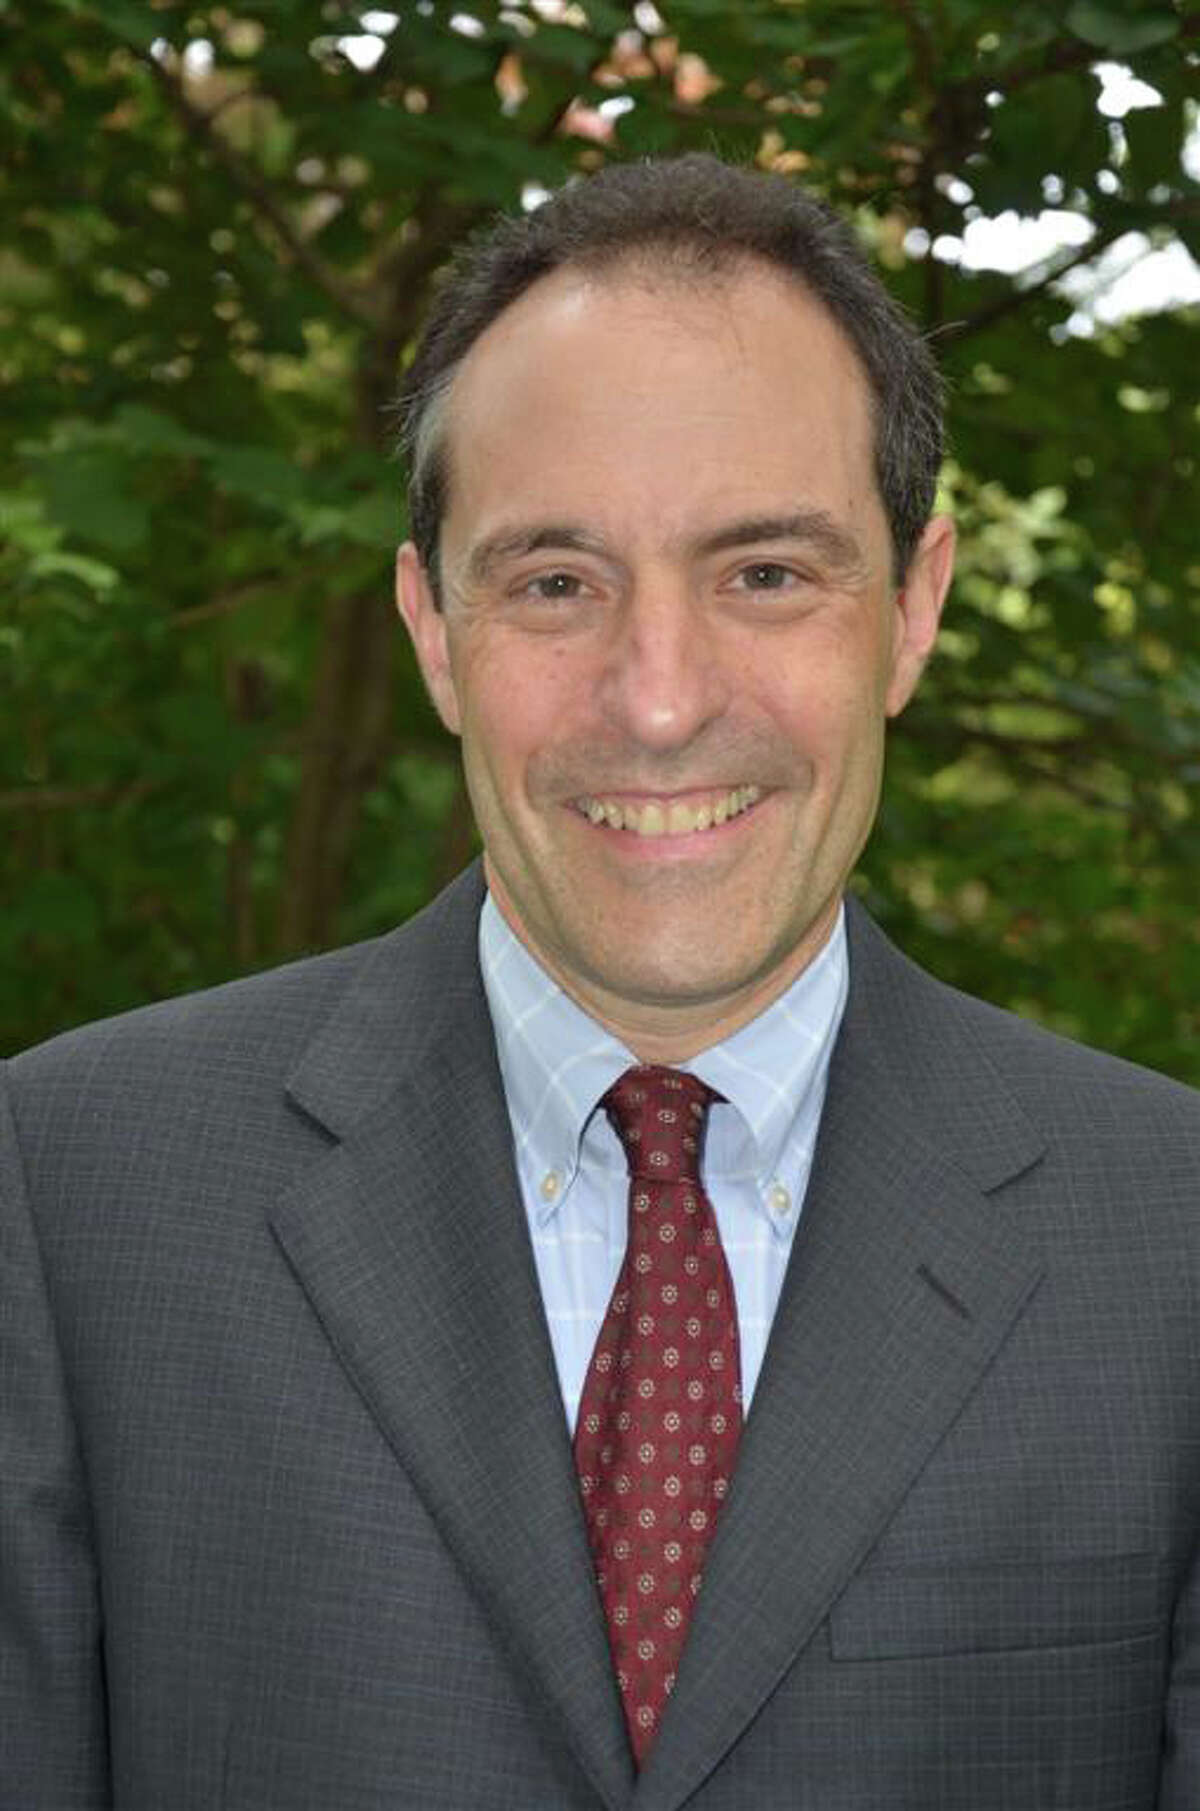 Richard Freedman, Democratic candidate for the Board of Finance.